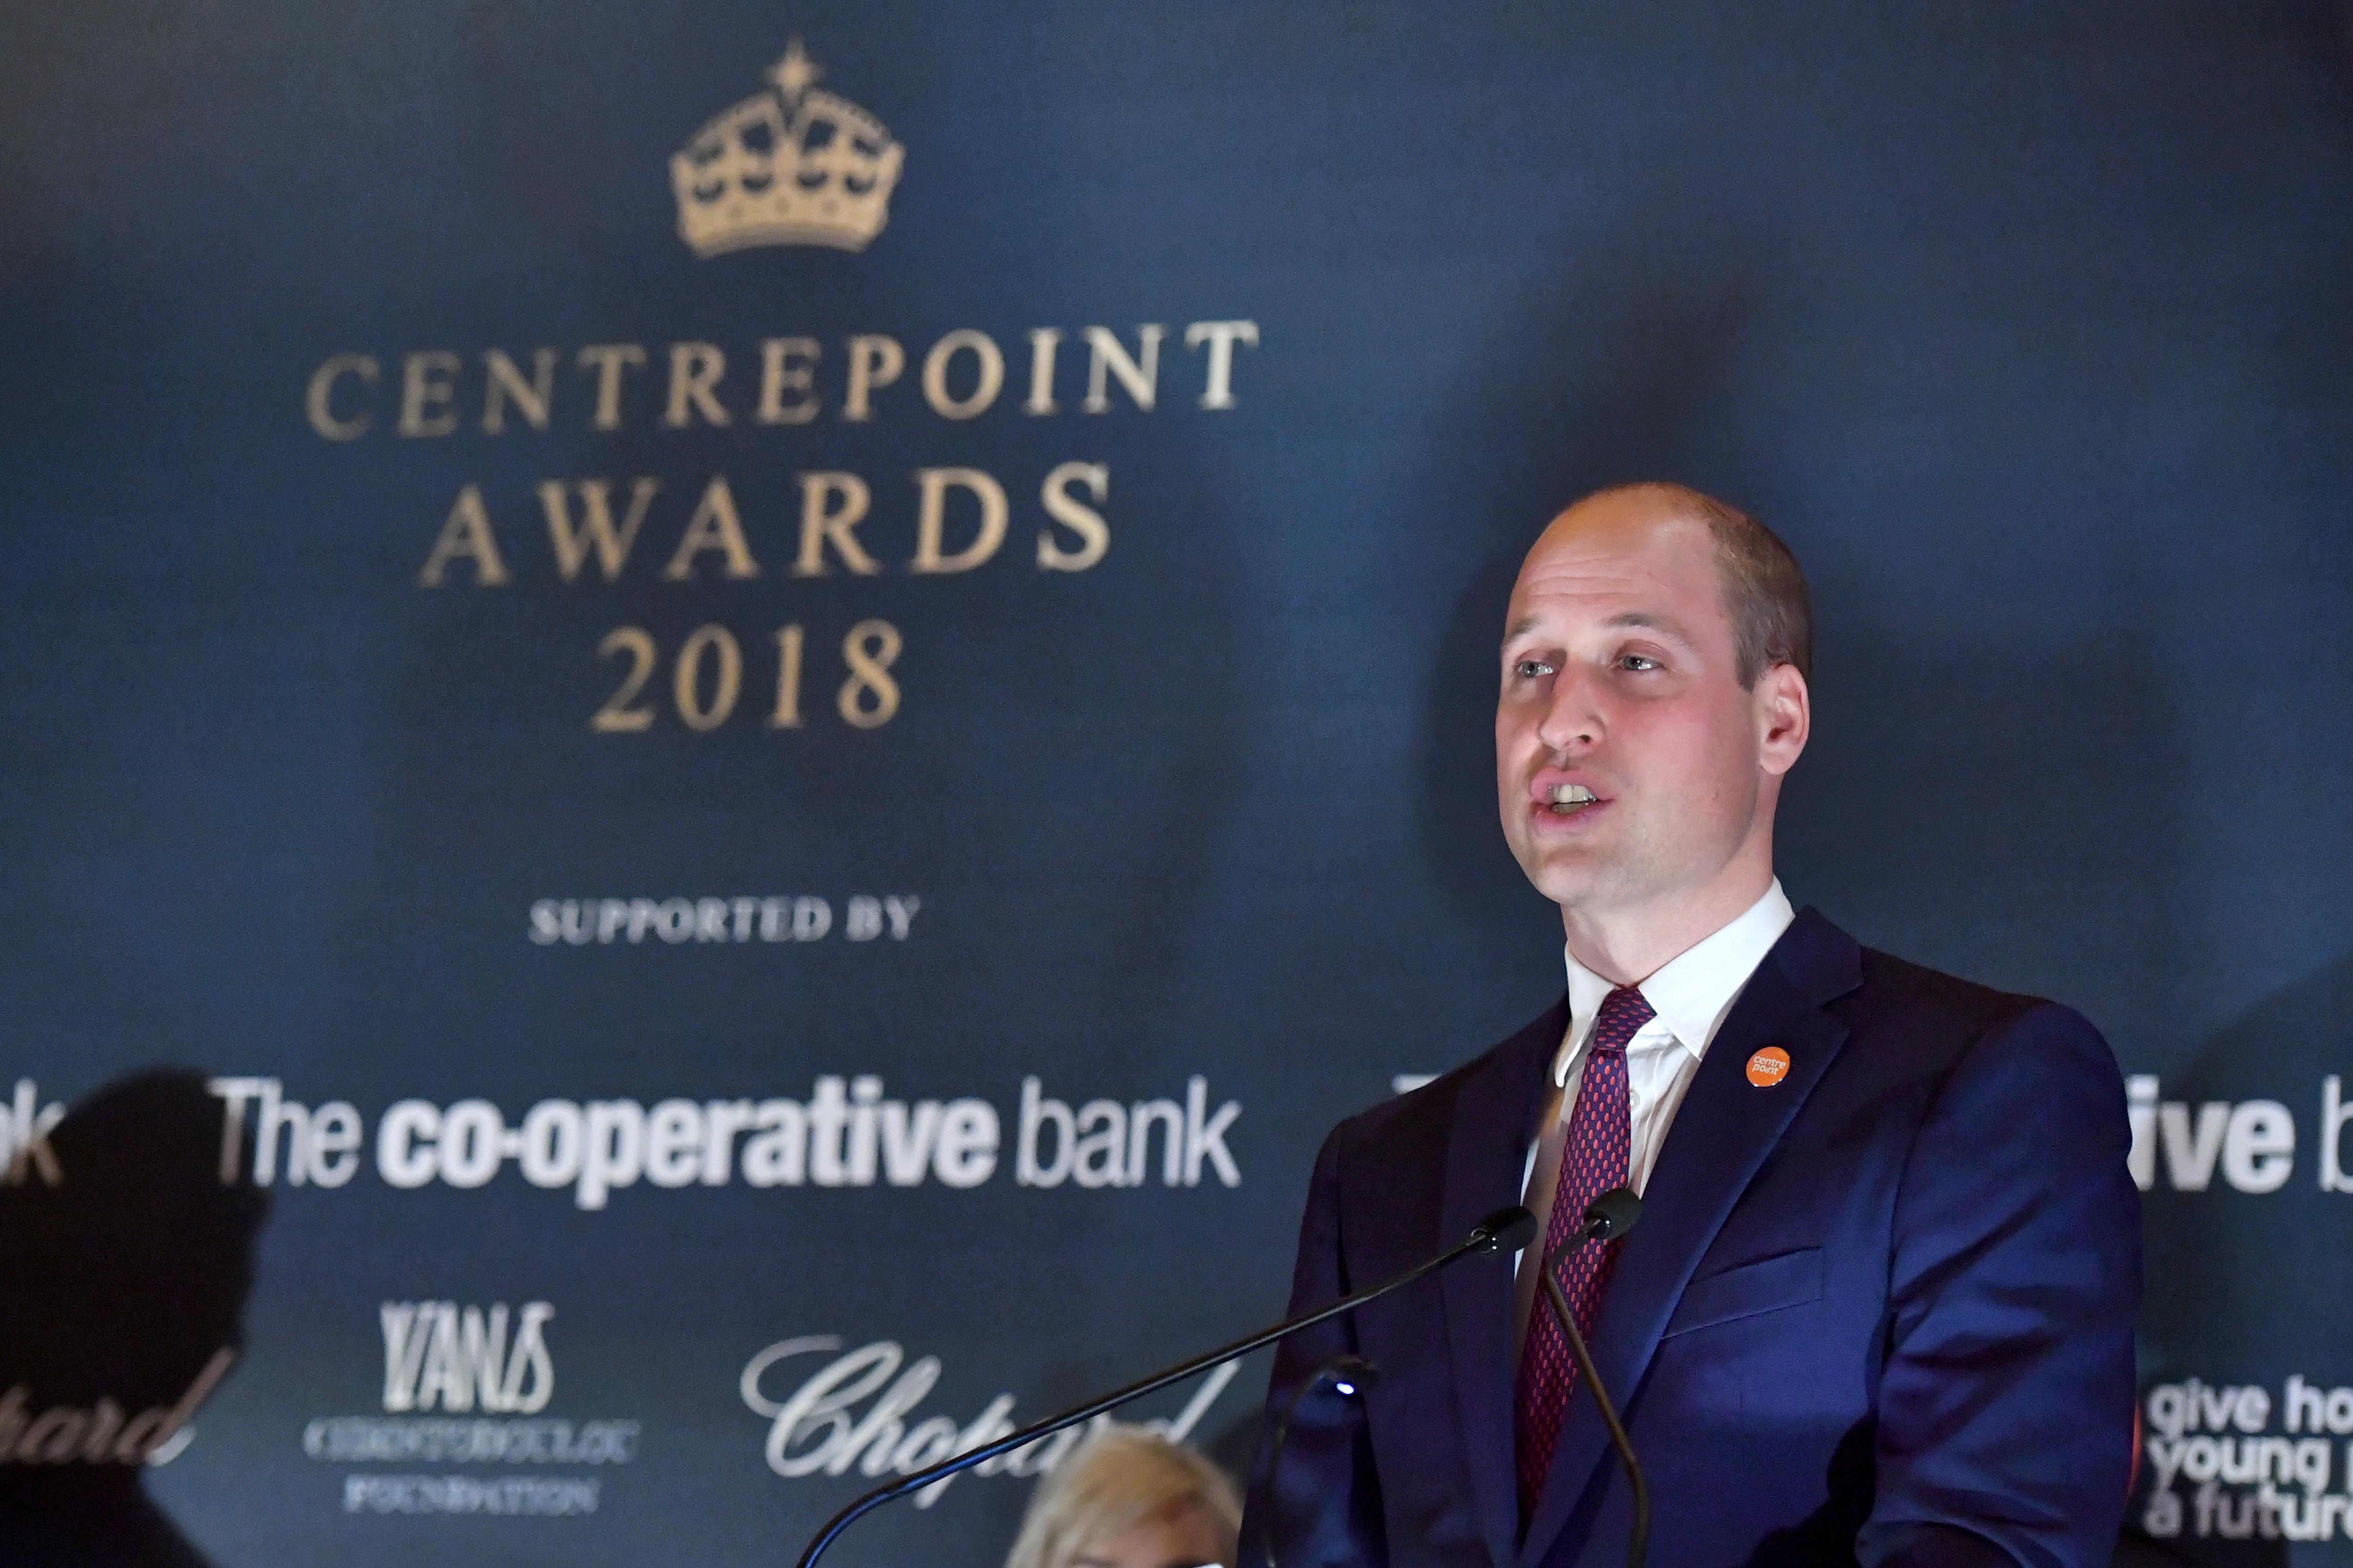 william centrepoint awards